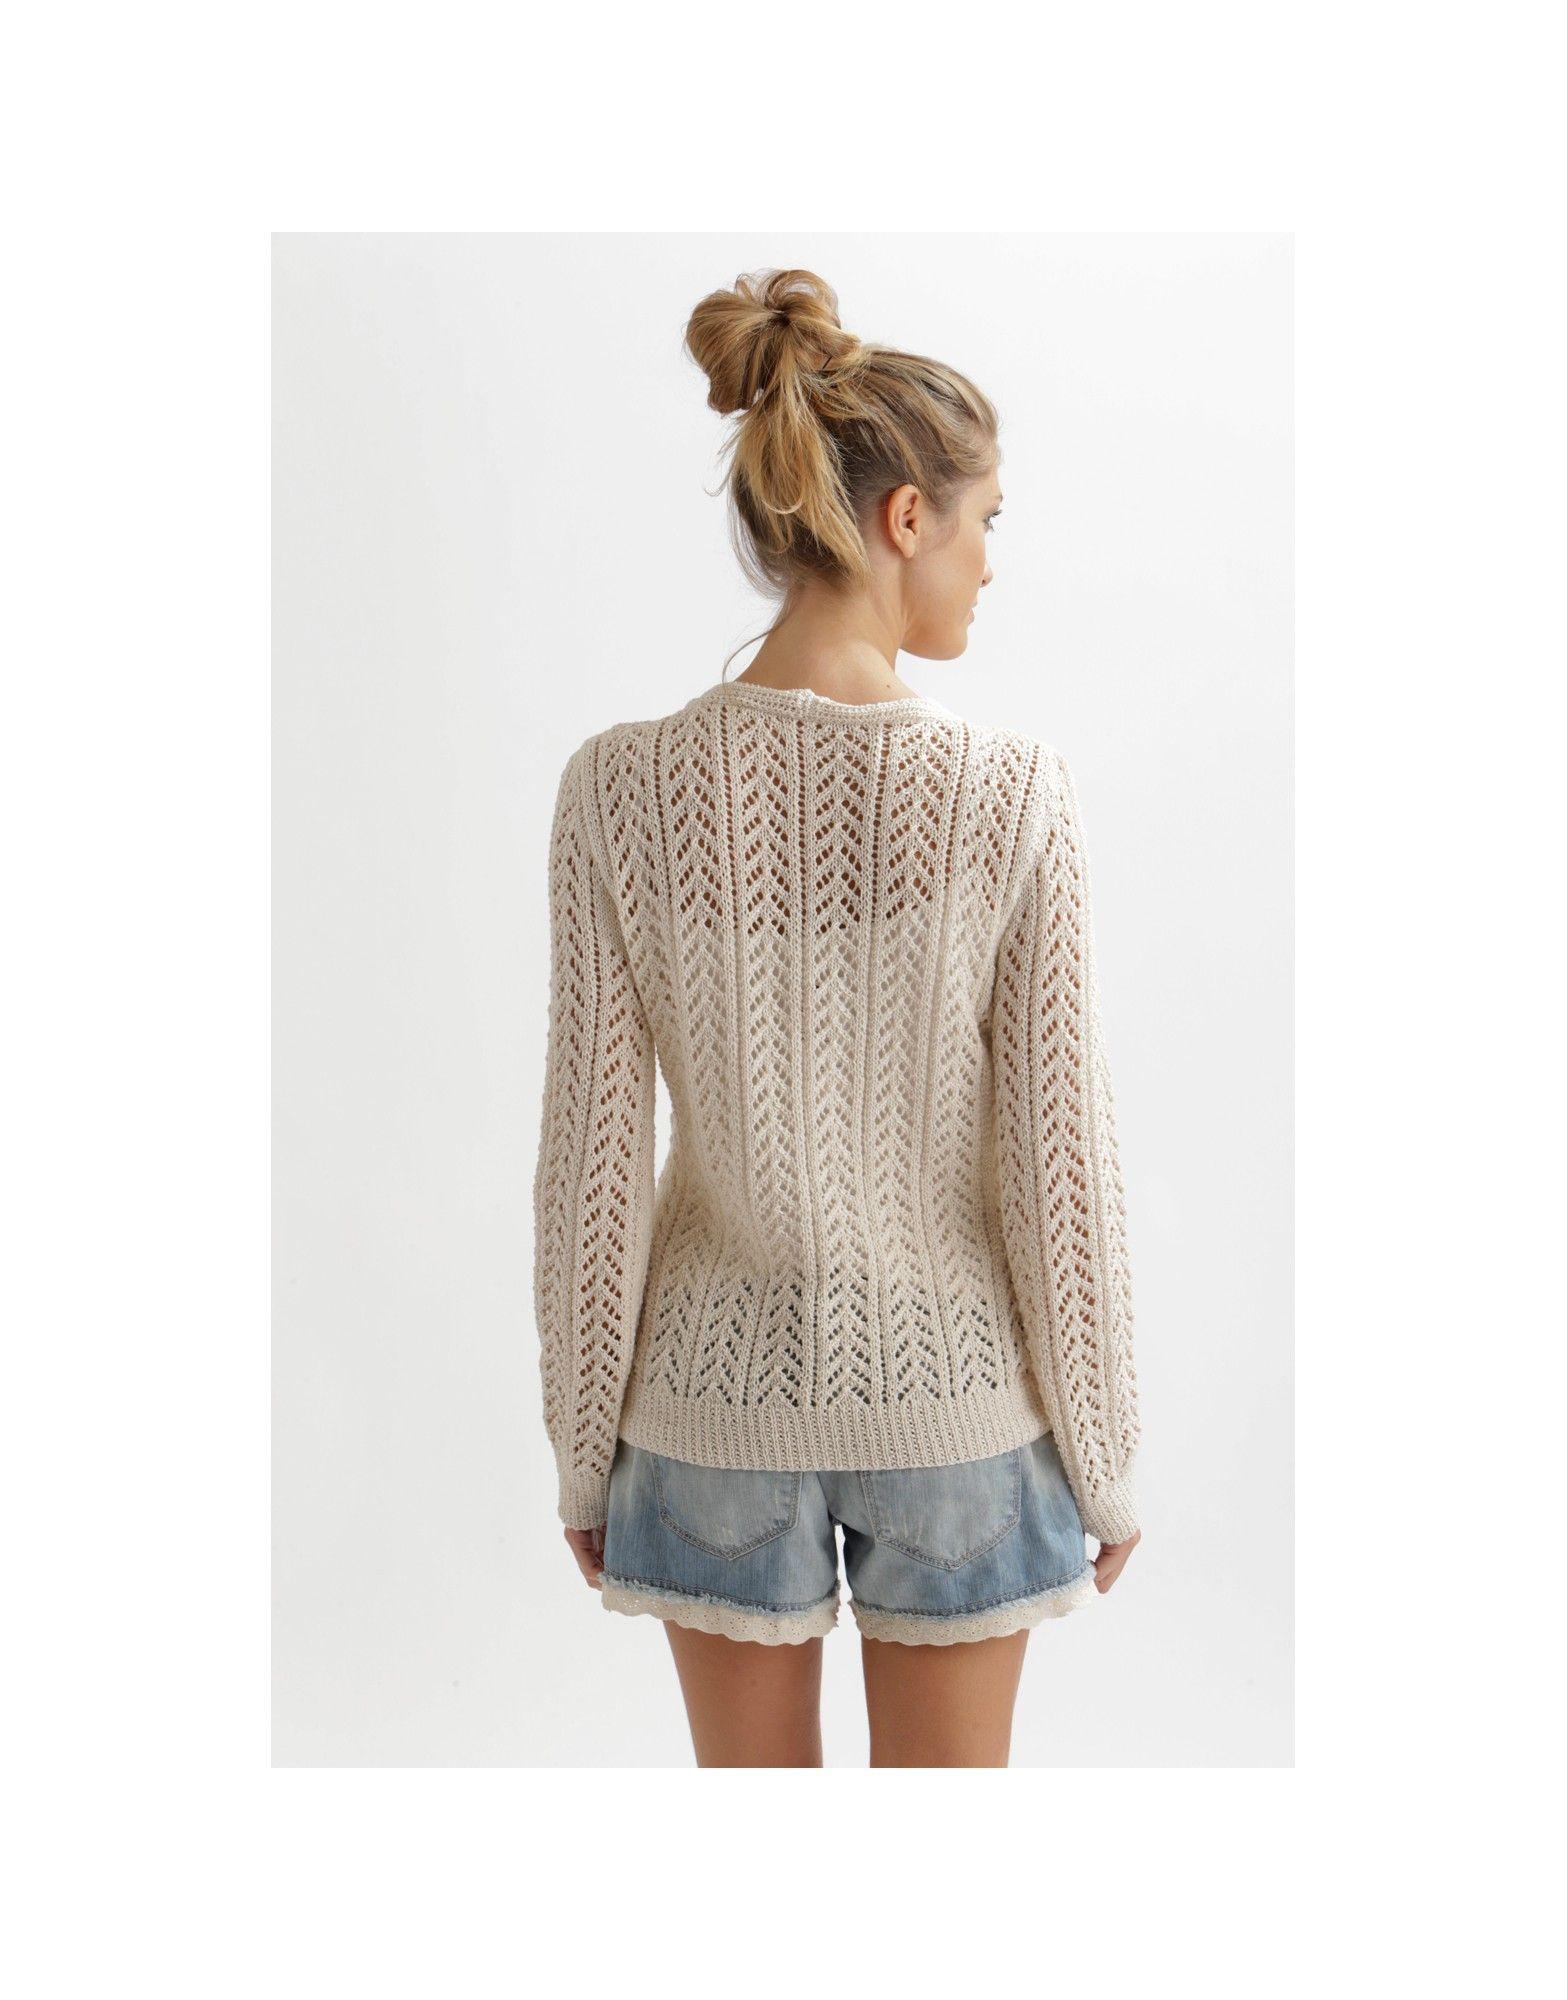 Arrow Lace Cardigan Free Knitting Pattern for Women - Free Download ...